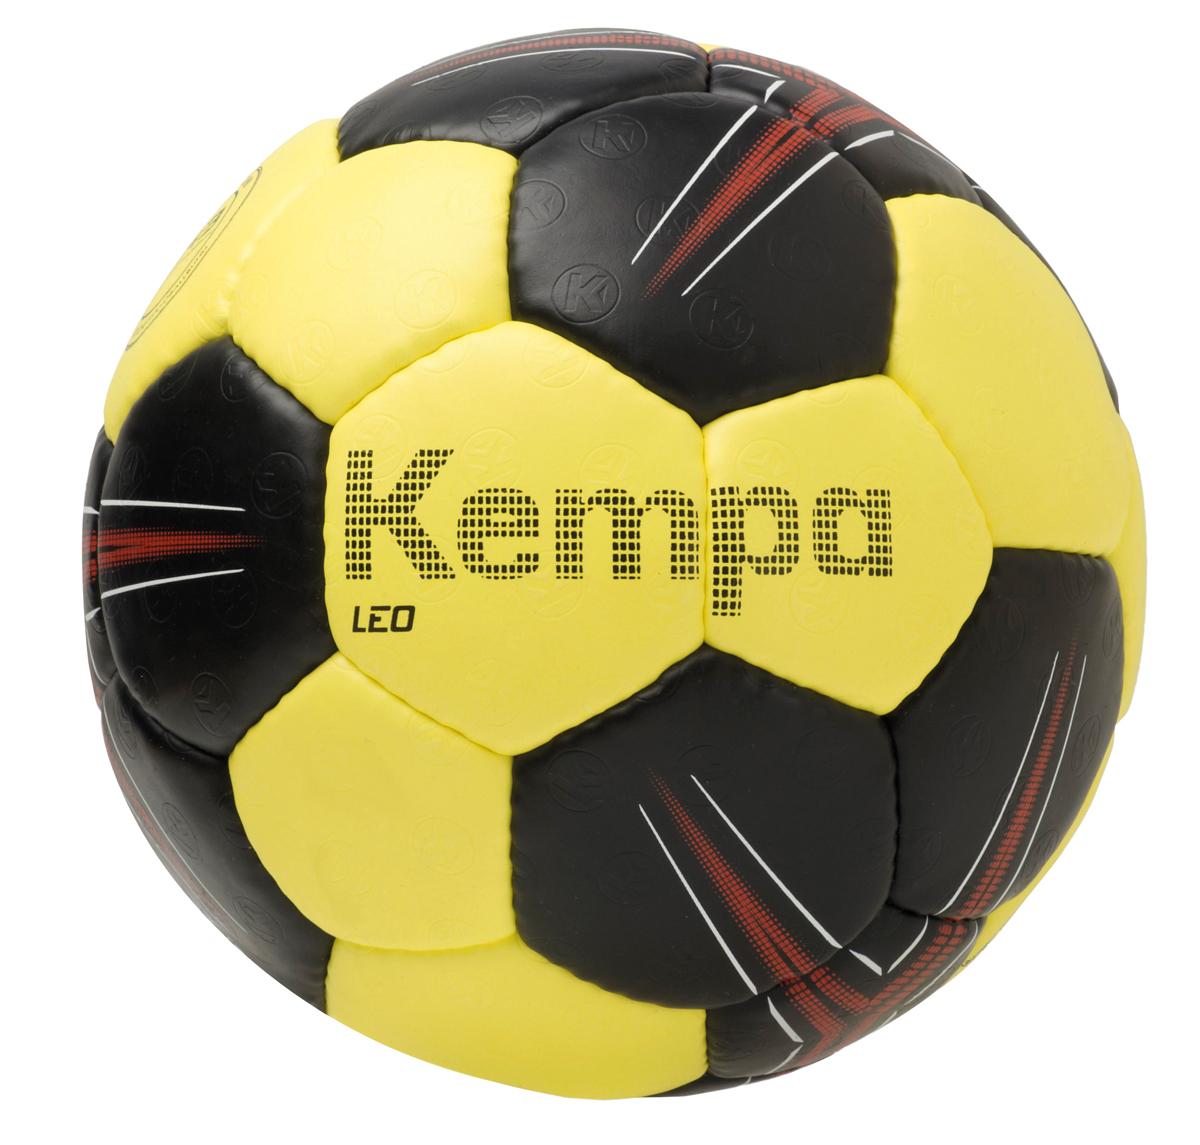 Image of   Kempa Leo Handball - Størrelse 0 - Black / Lime Gul / Rød